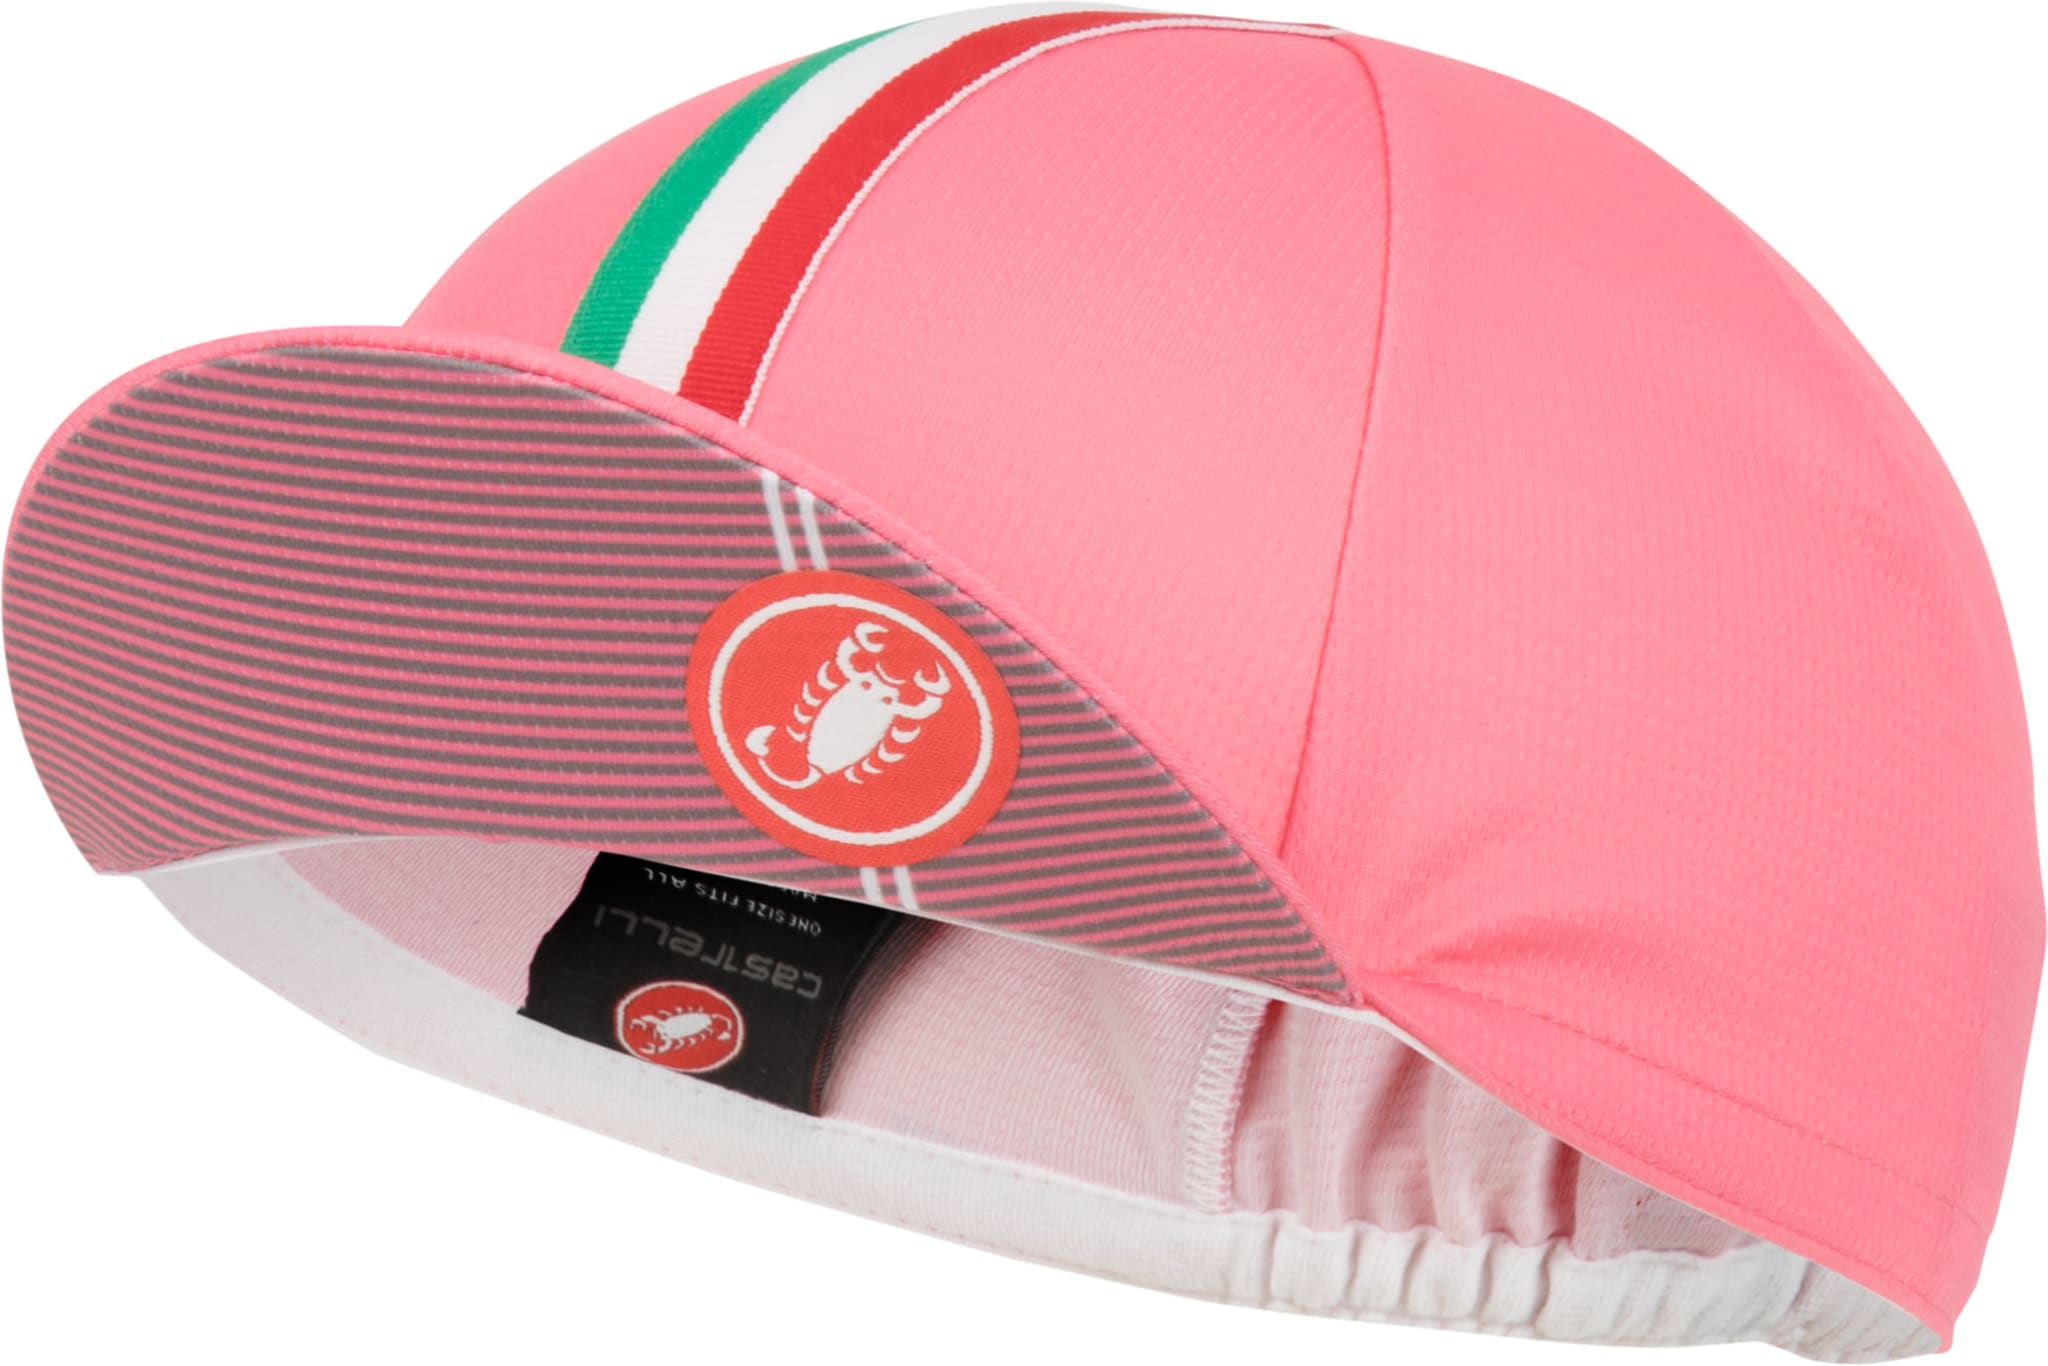 Rosso Corsa Cycling Cap